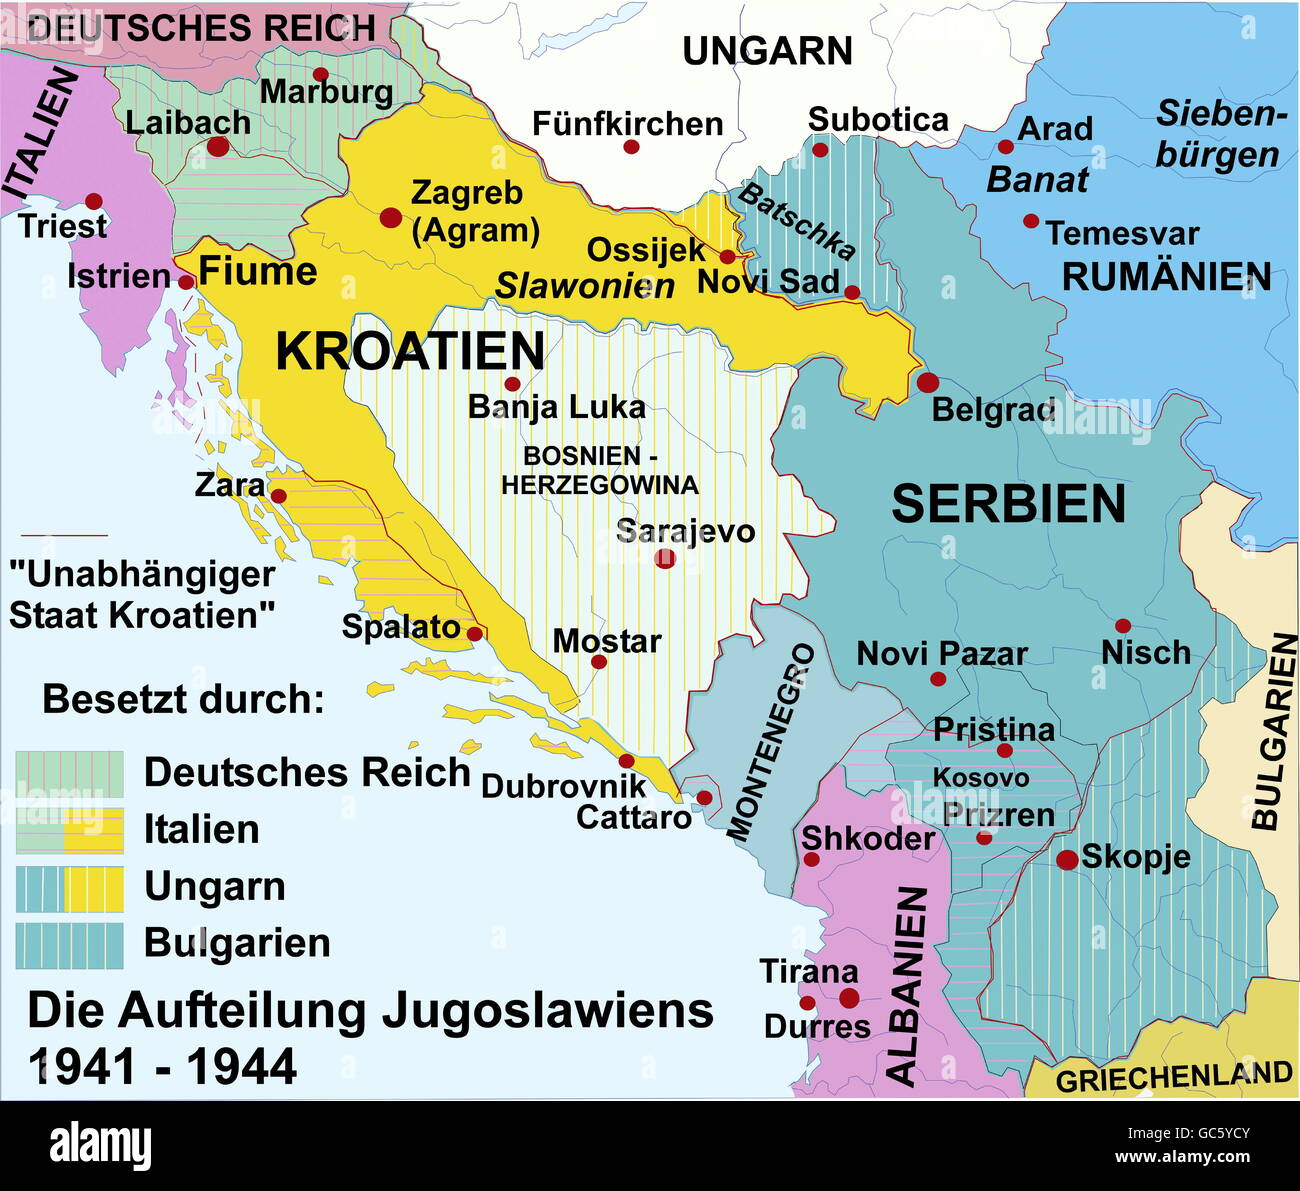 Alte Jugoslawien Karte.Kartographie Historische Karten Moderne Zeiten Europa